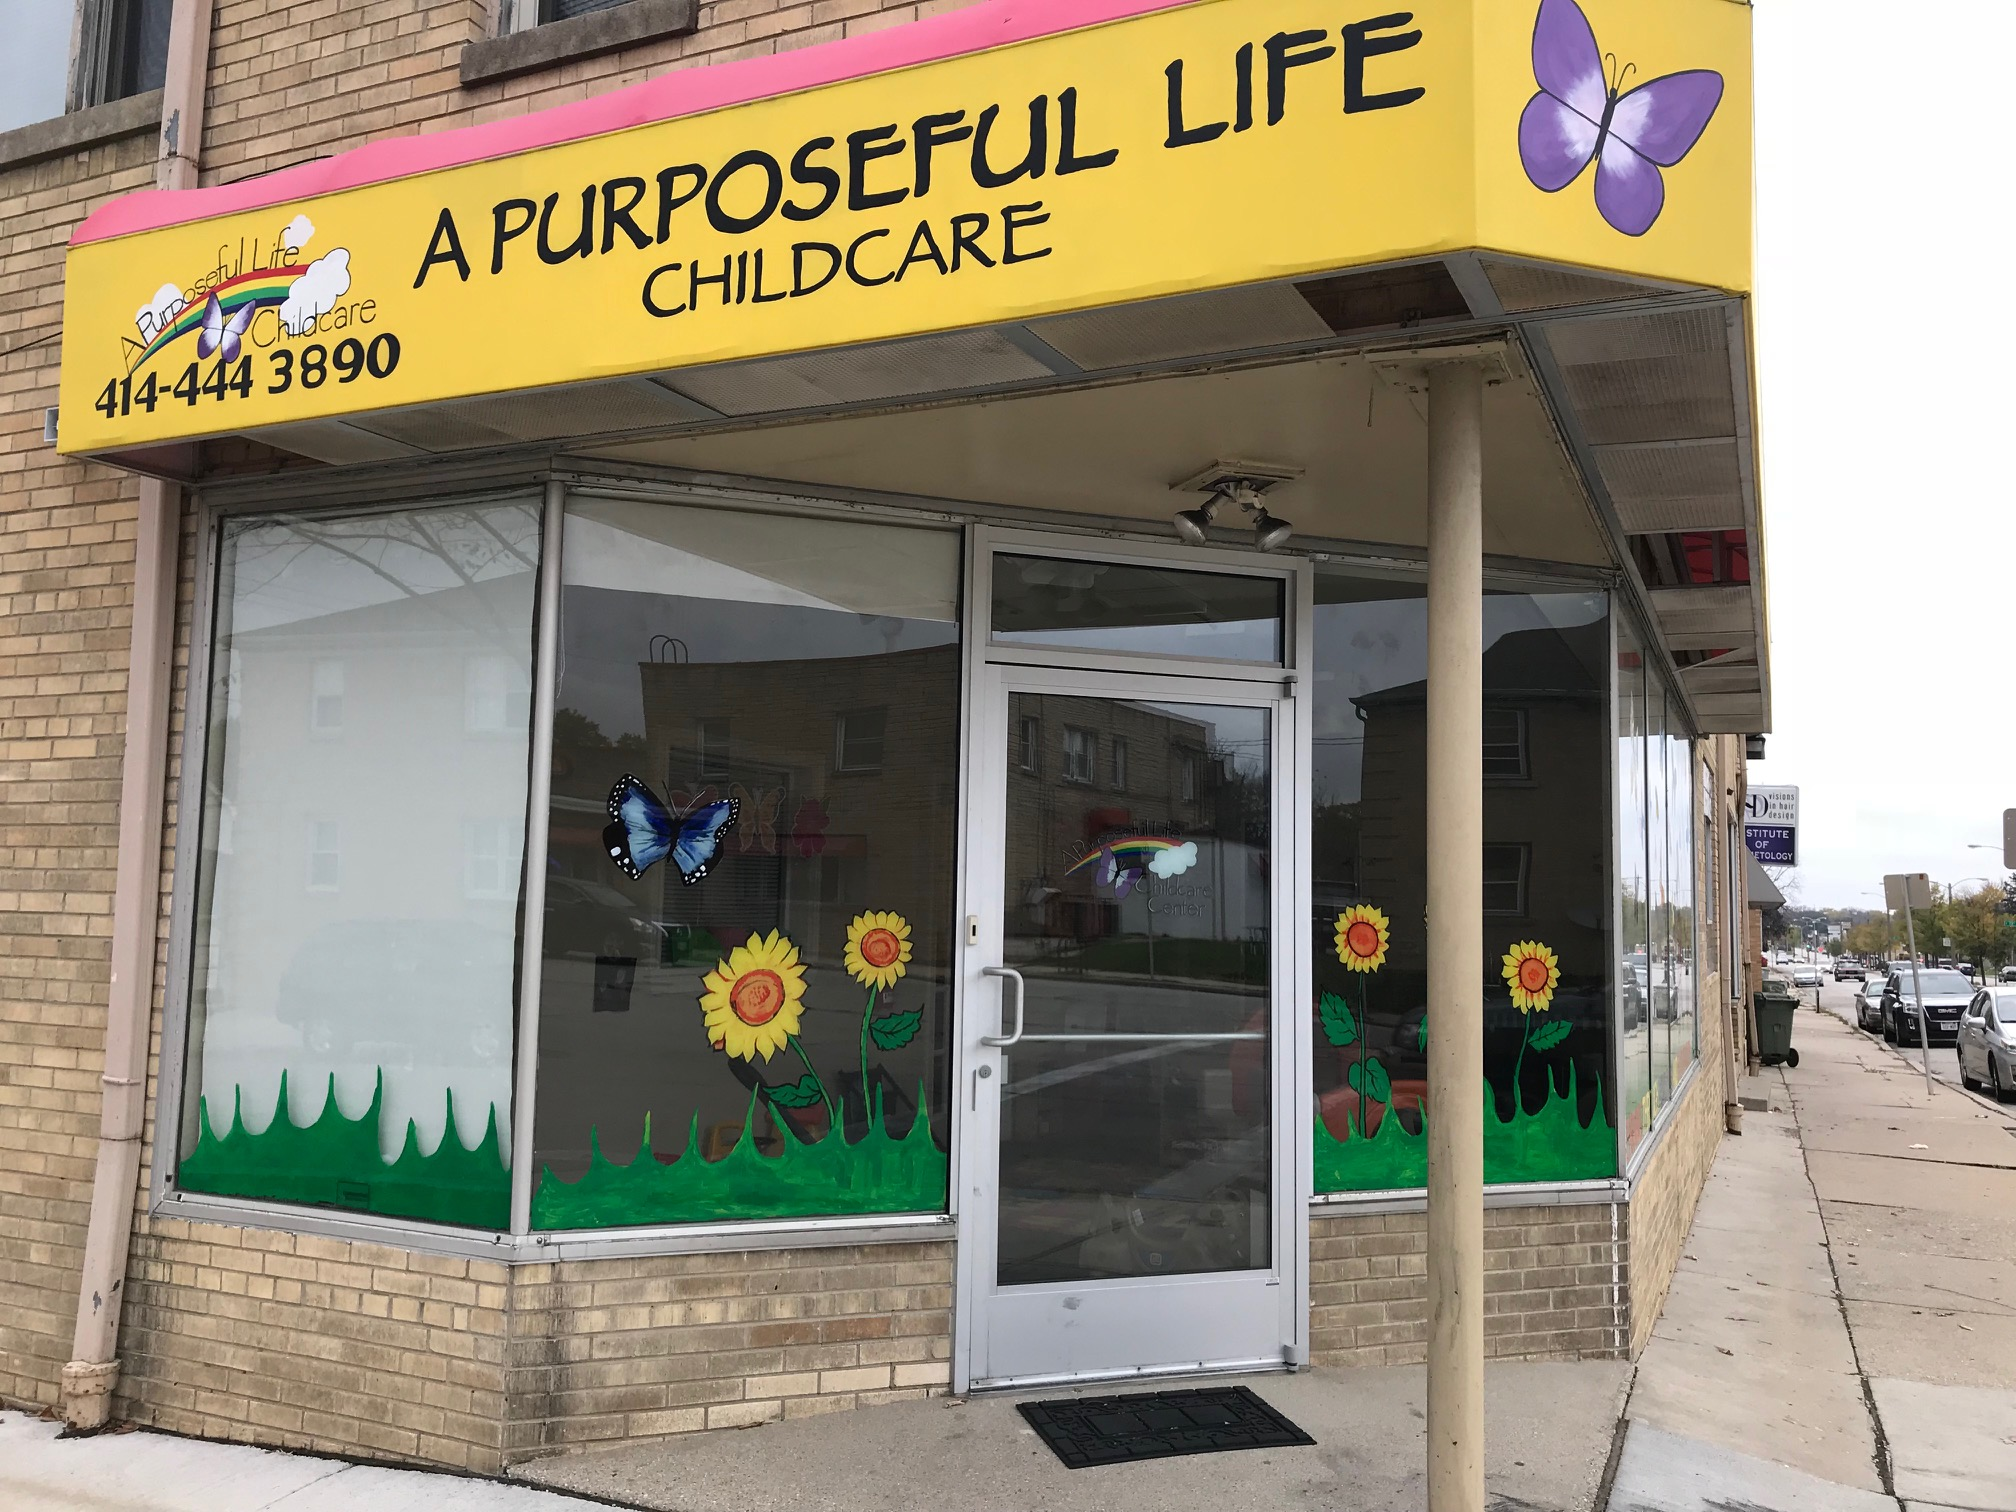 Apurposeful Life Daycare